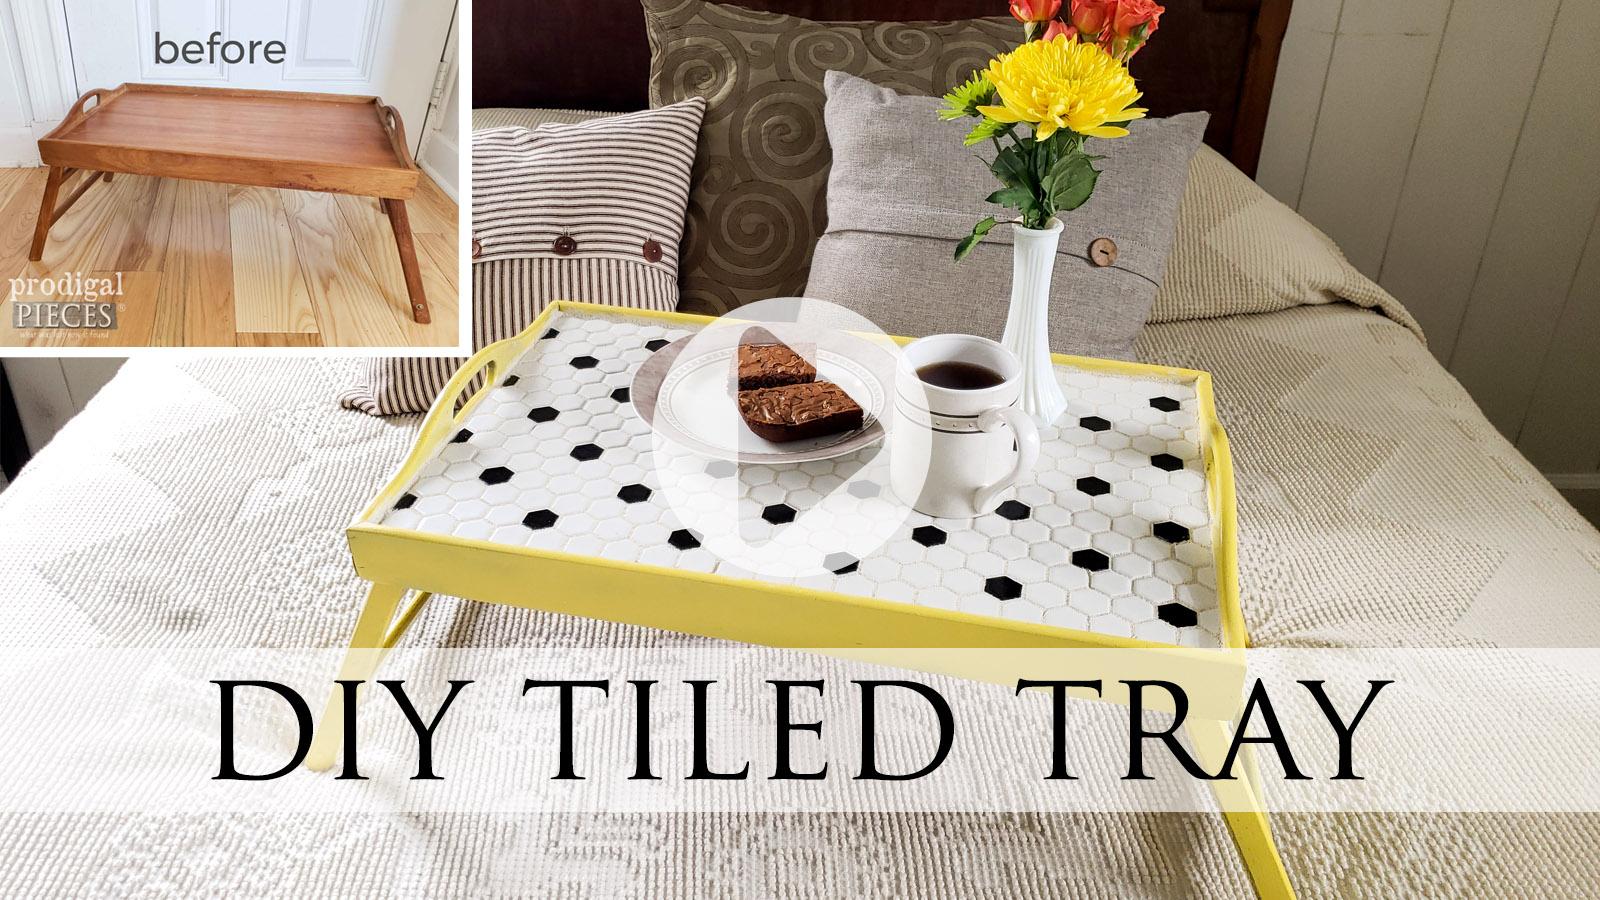 DIY Tiled Tray Tutorial by Larissa of Prodigal Pieces | prodigalpieces.com